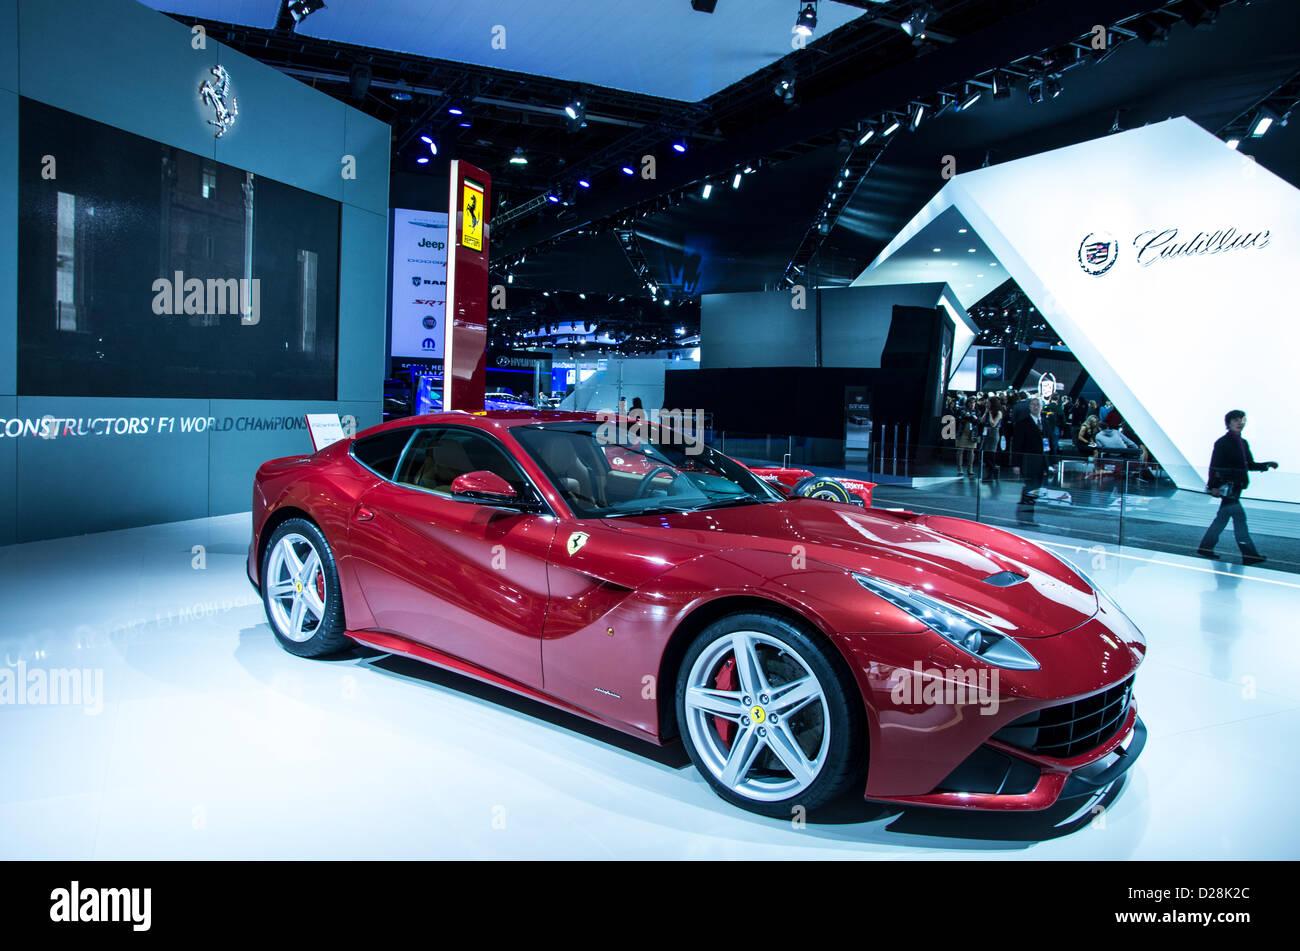 car, naias, northamerican international auto show, detroit, news